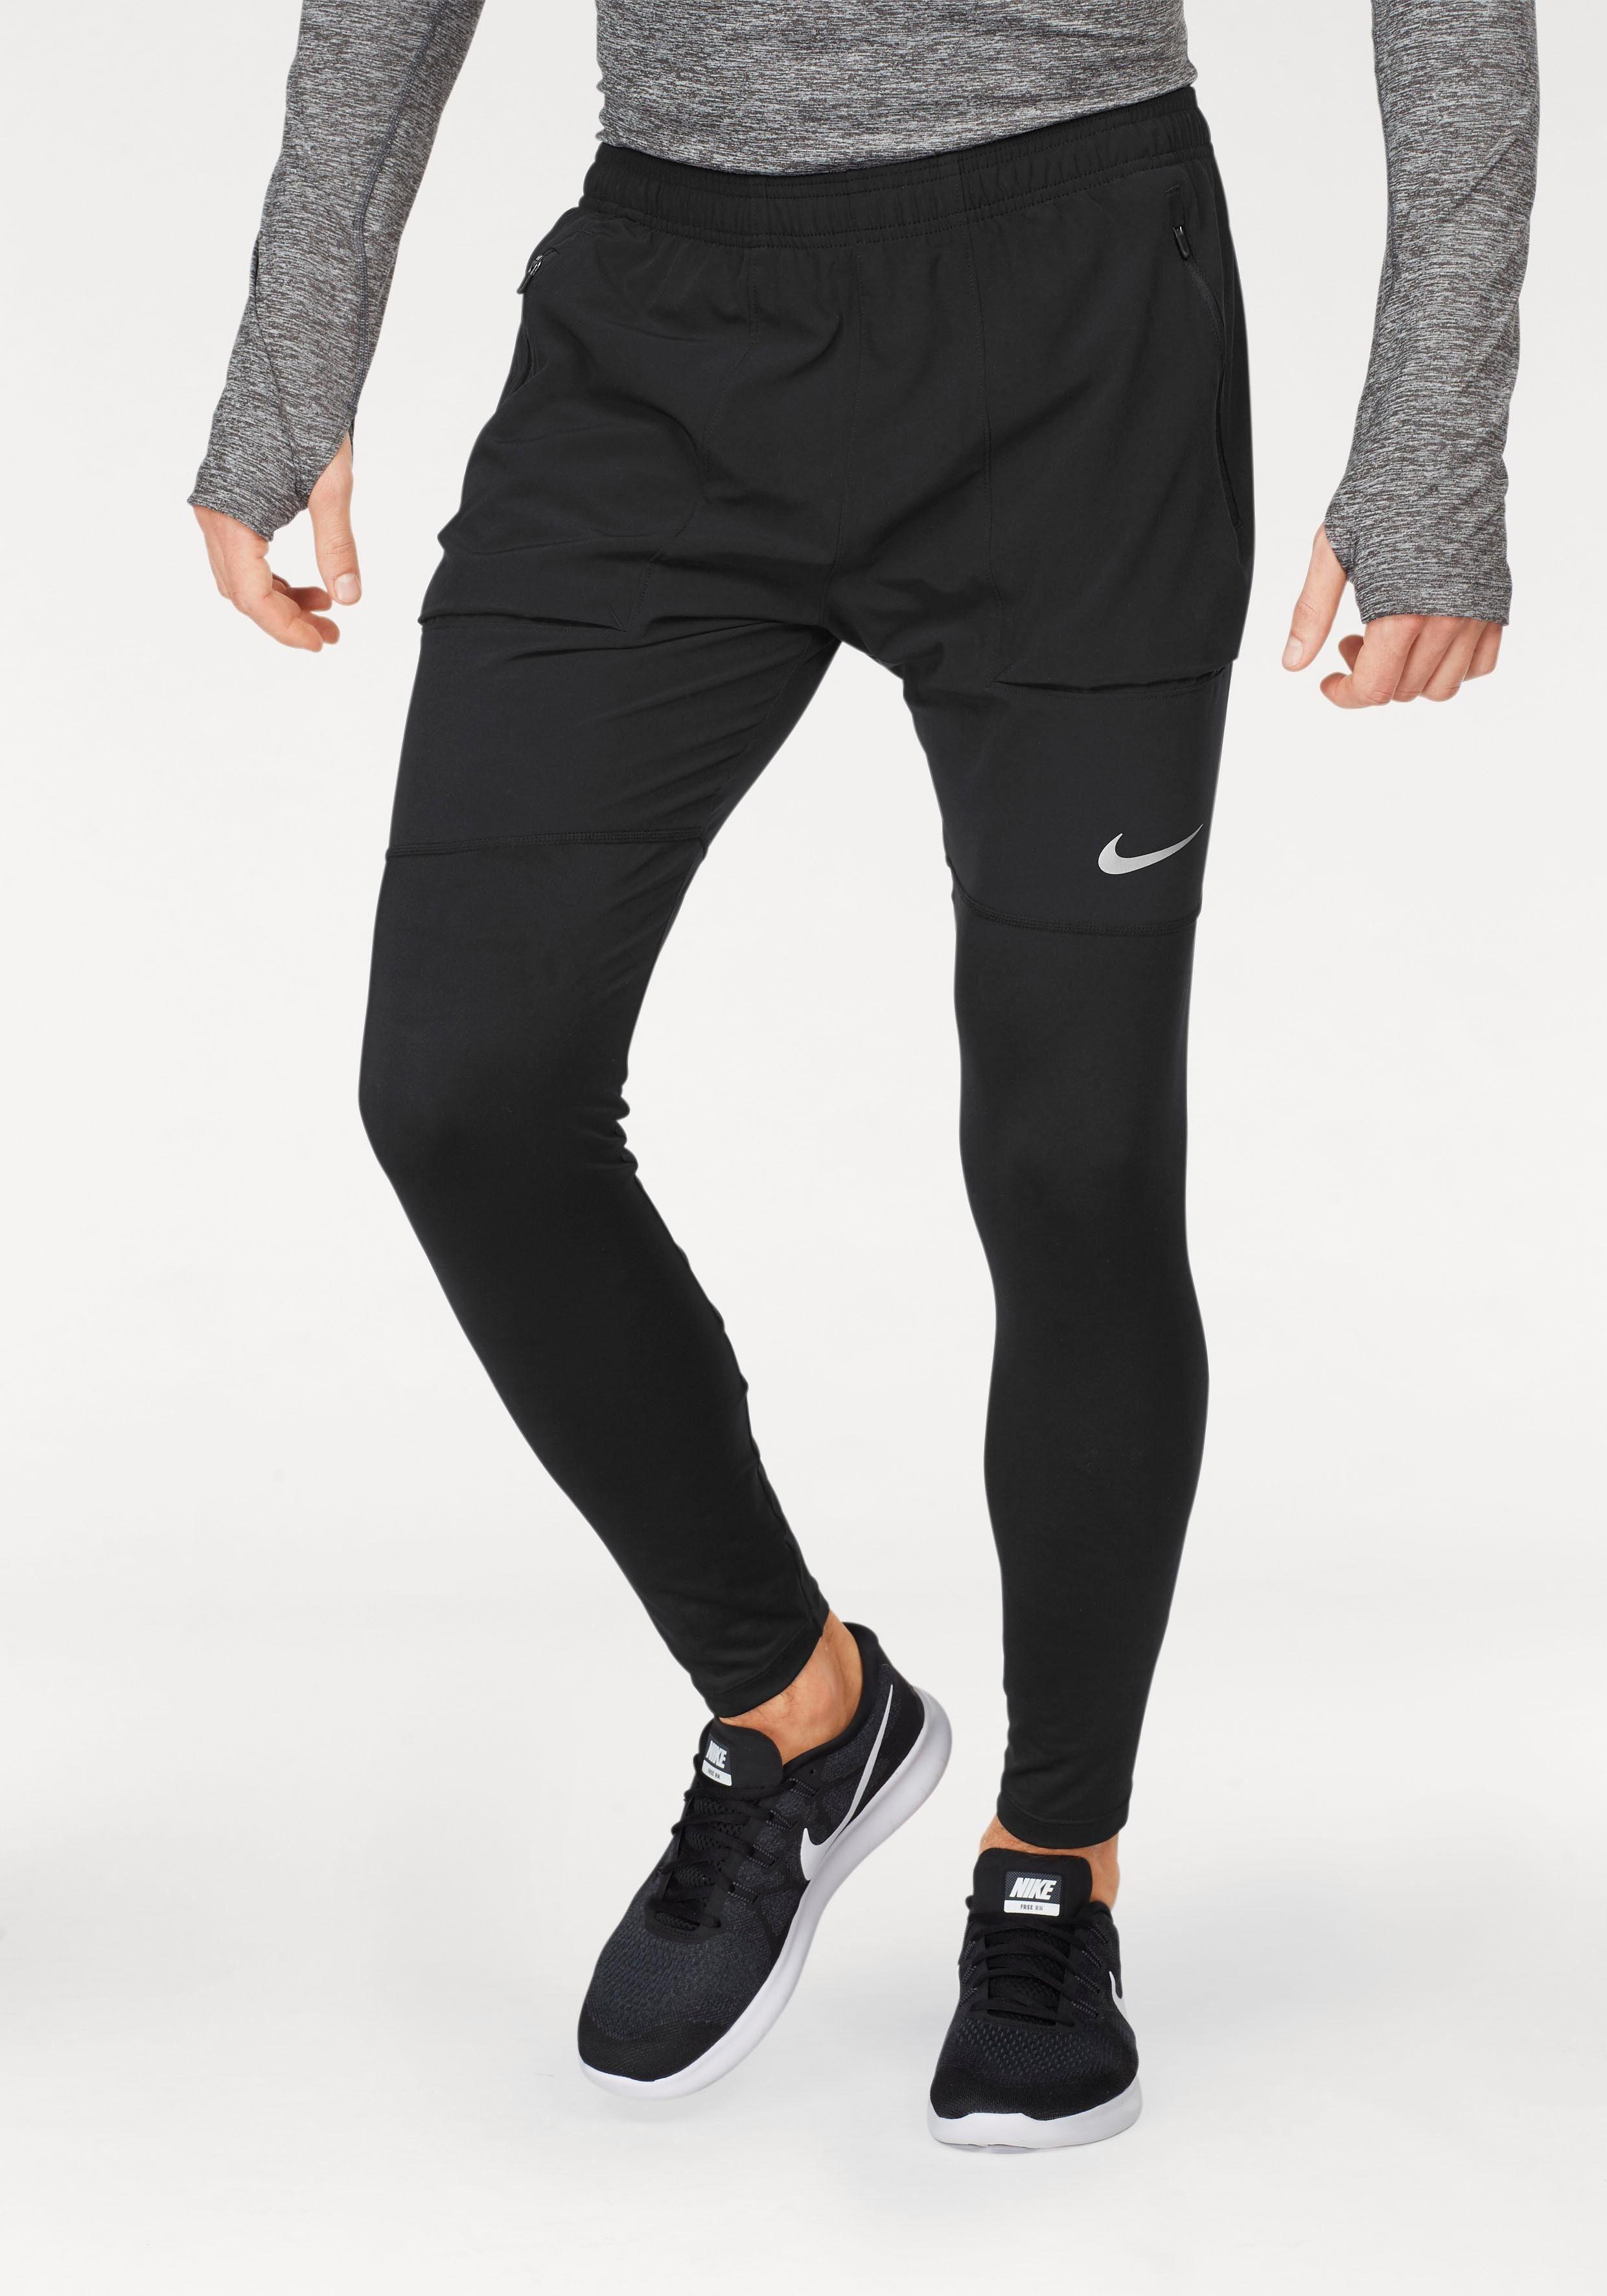 Nike Laufhose »ESSENTIALS HYBRID PANT« kaufen | OTTO